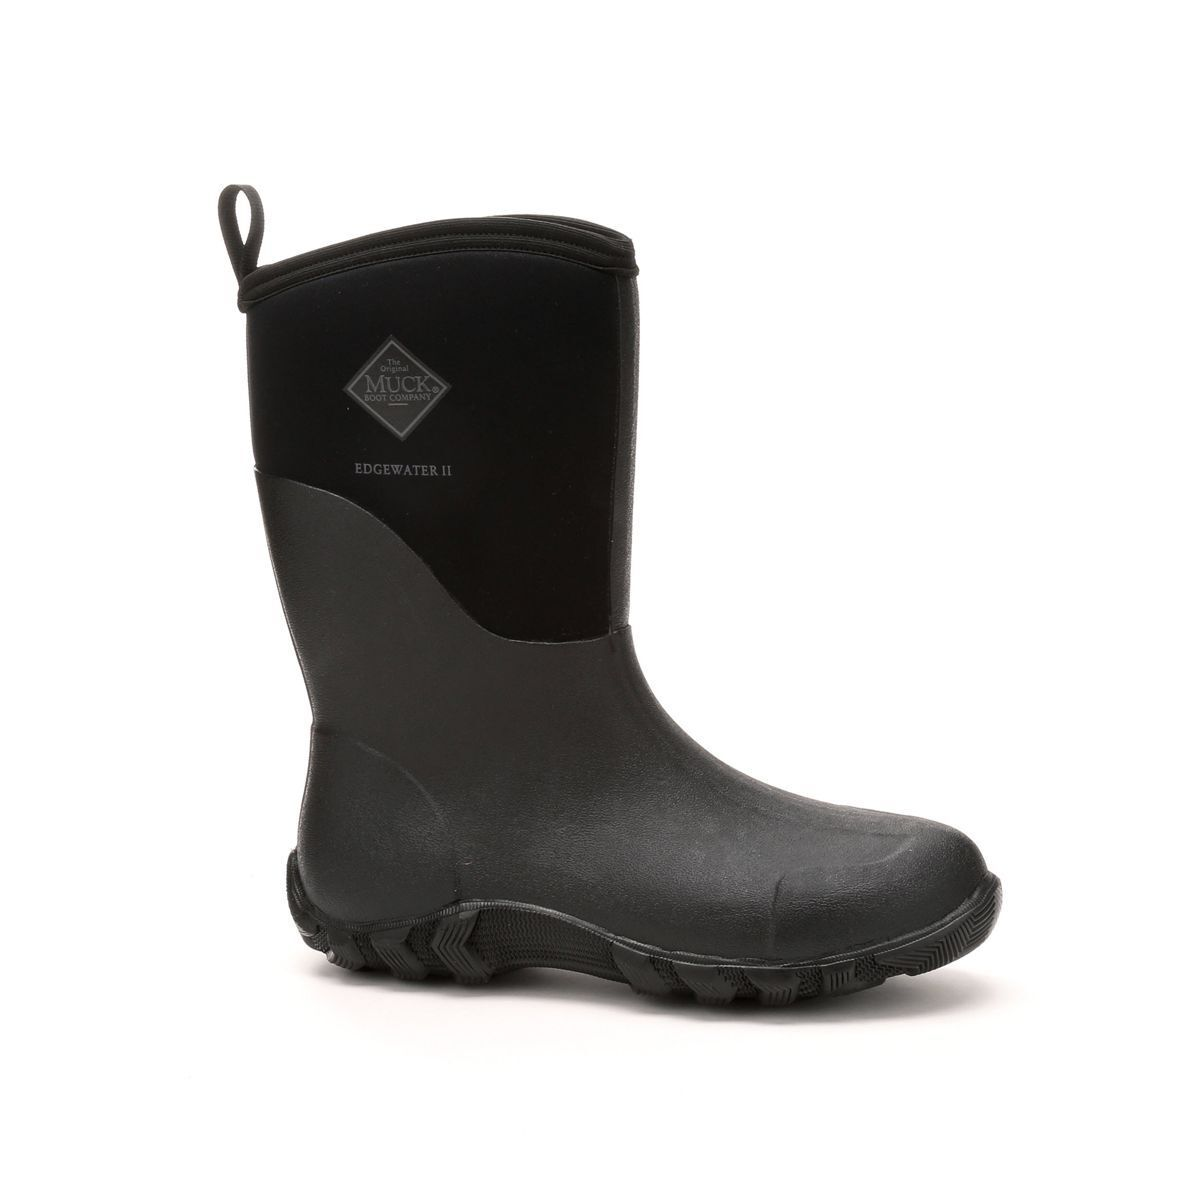 Muck Boots Company Adult Men's/Women's EDGEWATER II MID, BLACK, Neoprene Rubber